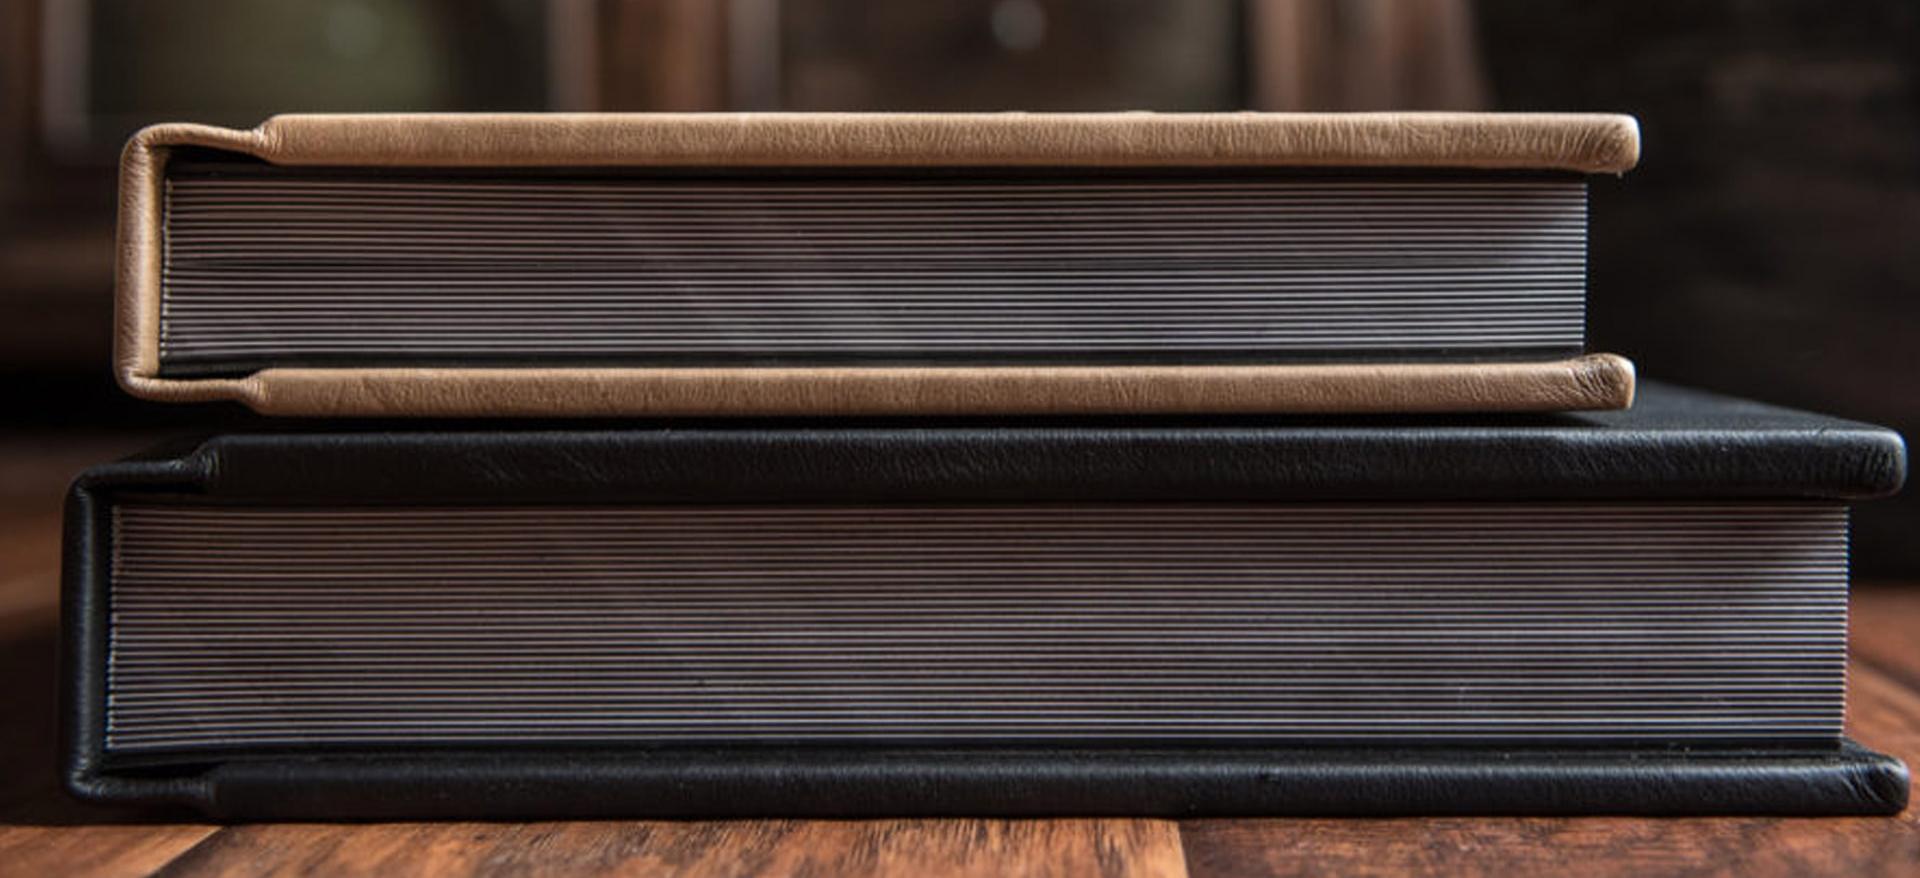 BlacksmithAlbums-1.jpg